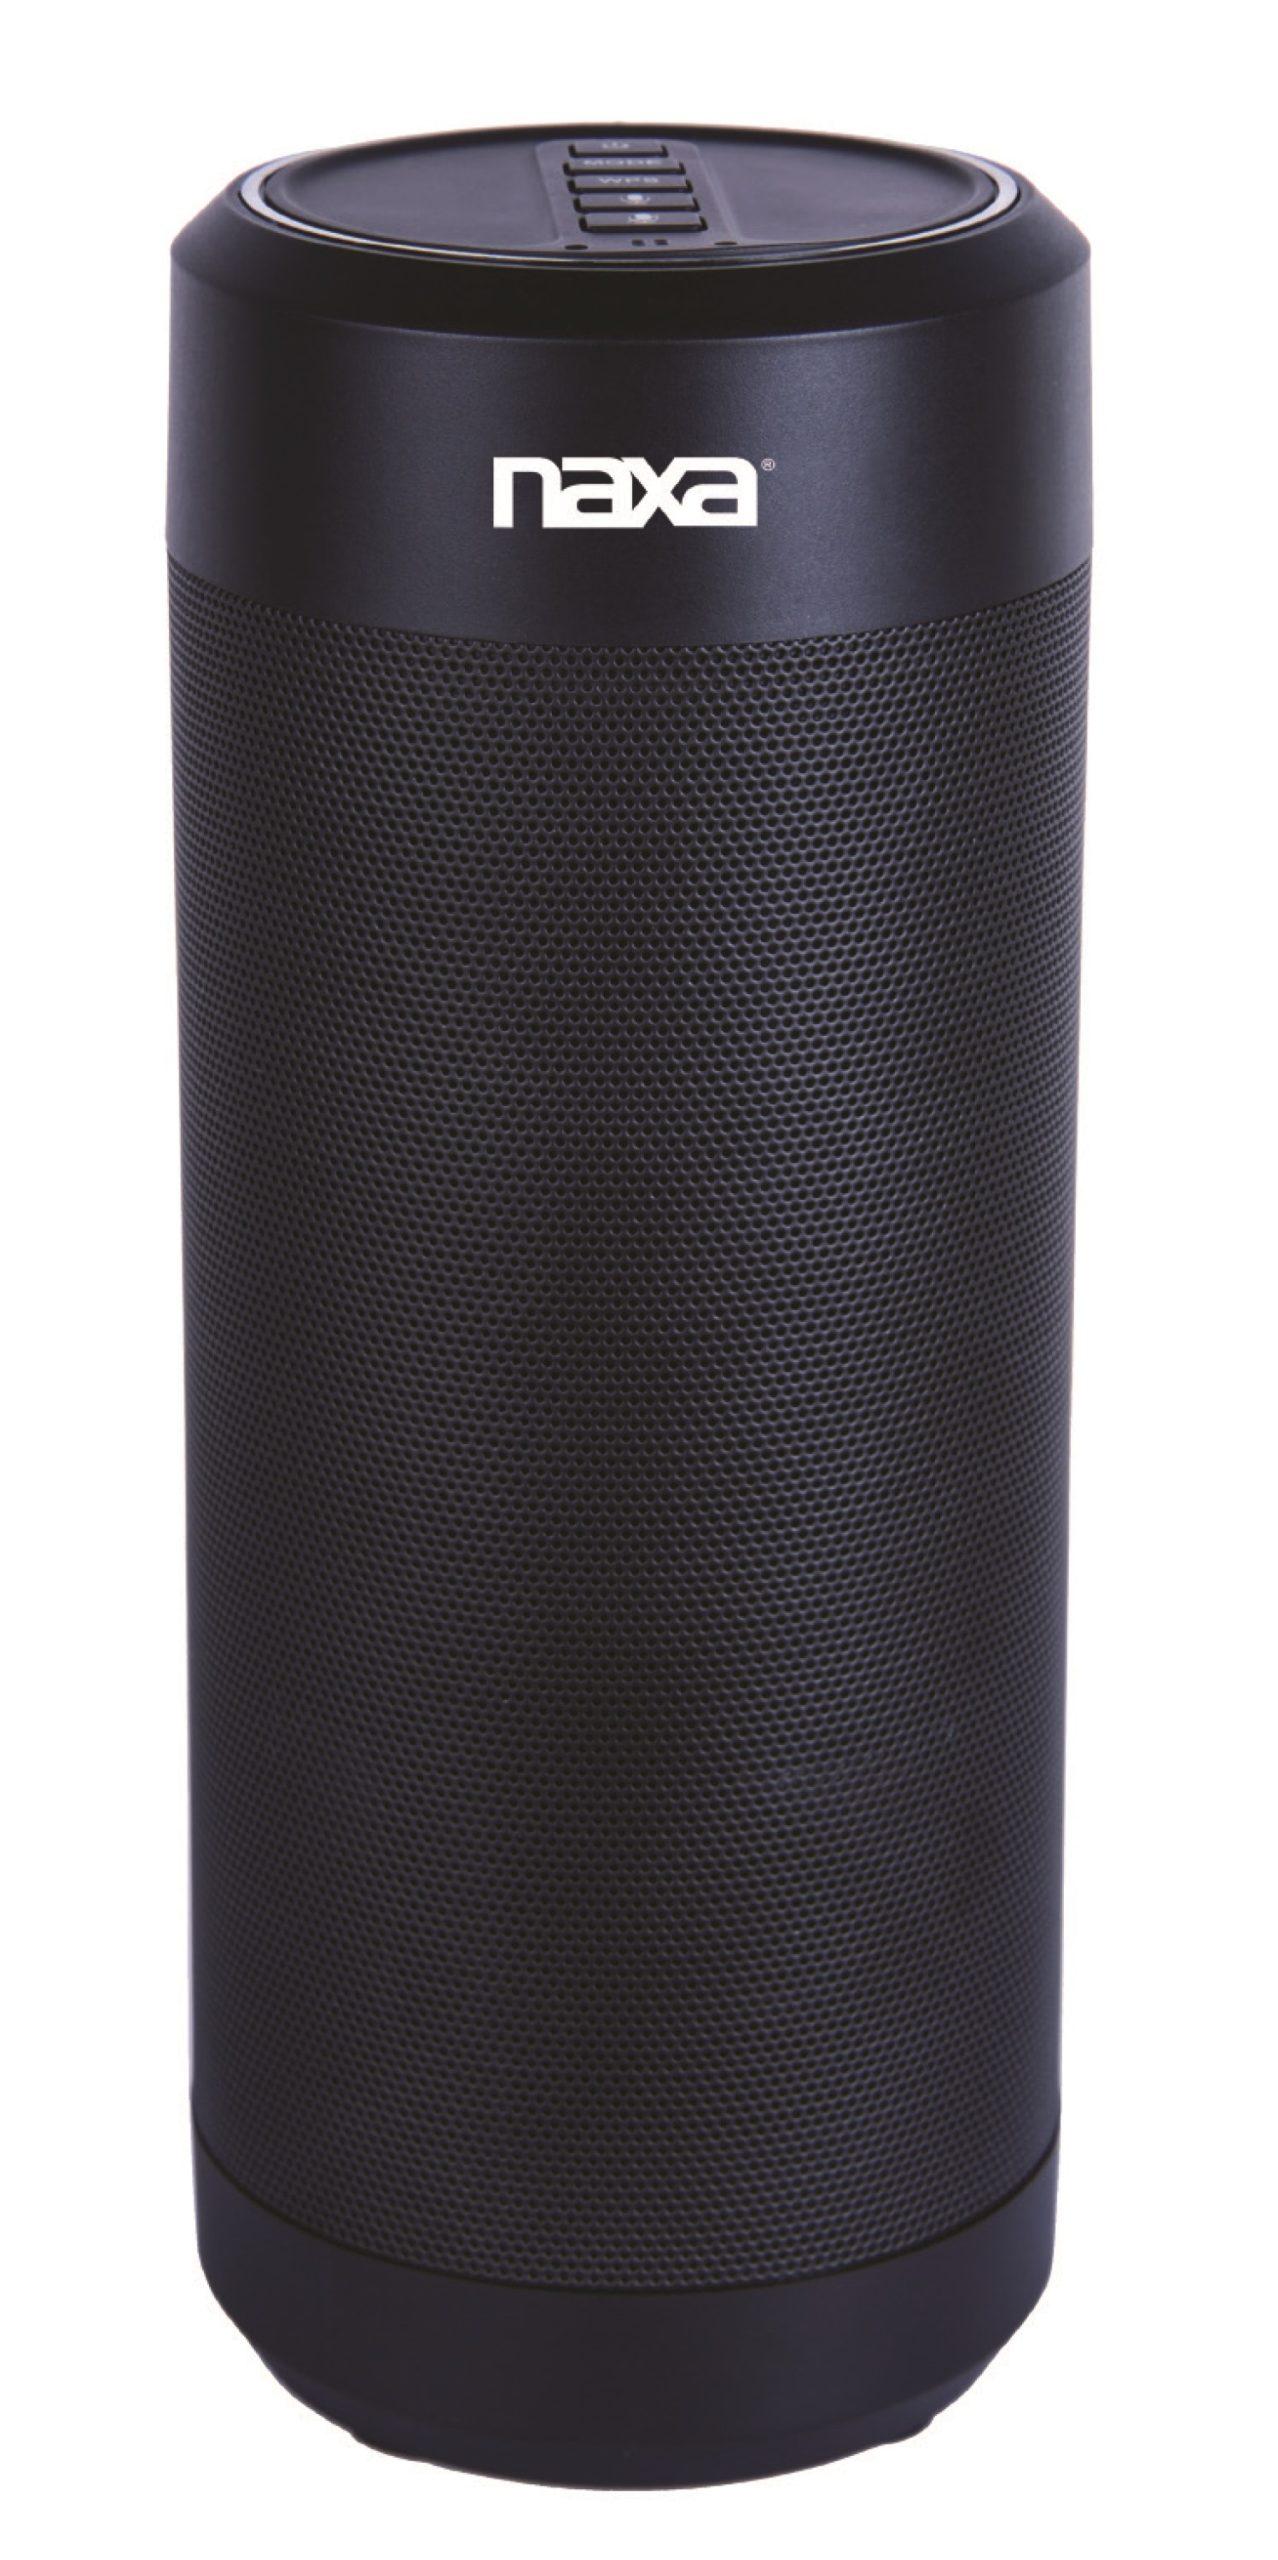 Wi-Fi & Bluetooth® Multi-Room Speaker with Amazon Alexa Voice Control